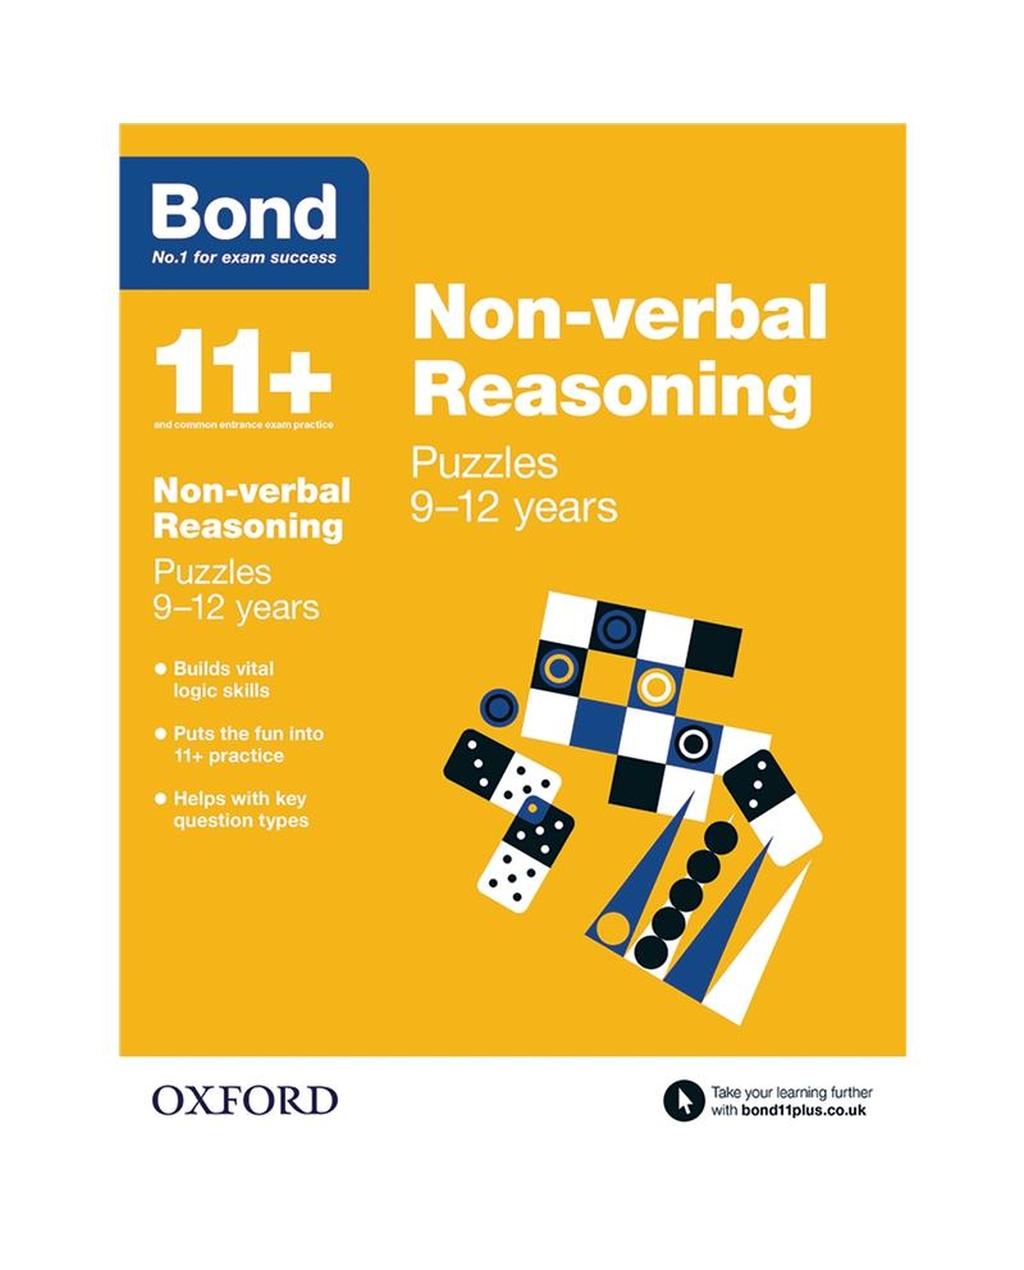 Bond Reasoning Puzzles Non-Verbal Reasoning 9-12 years